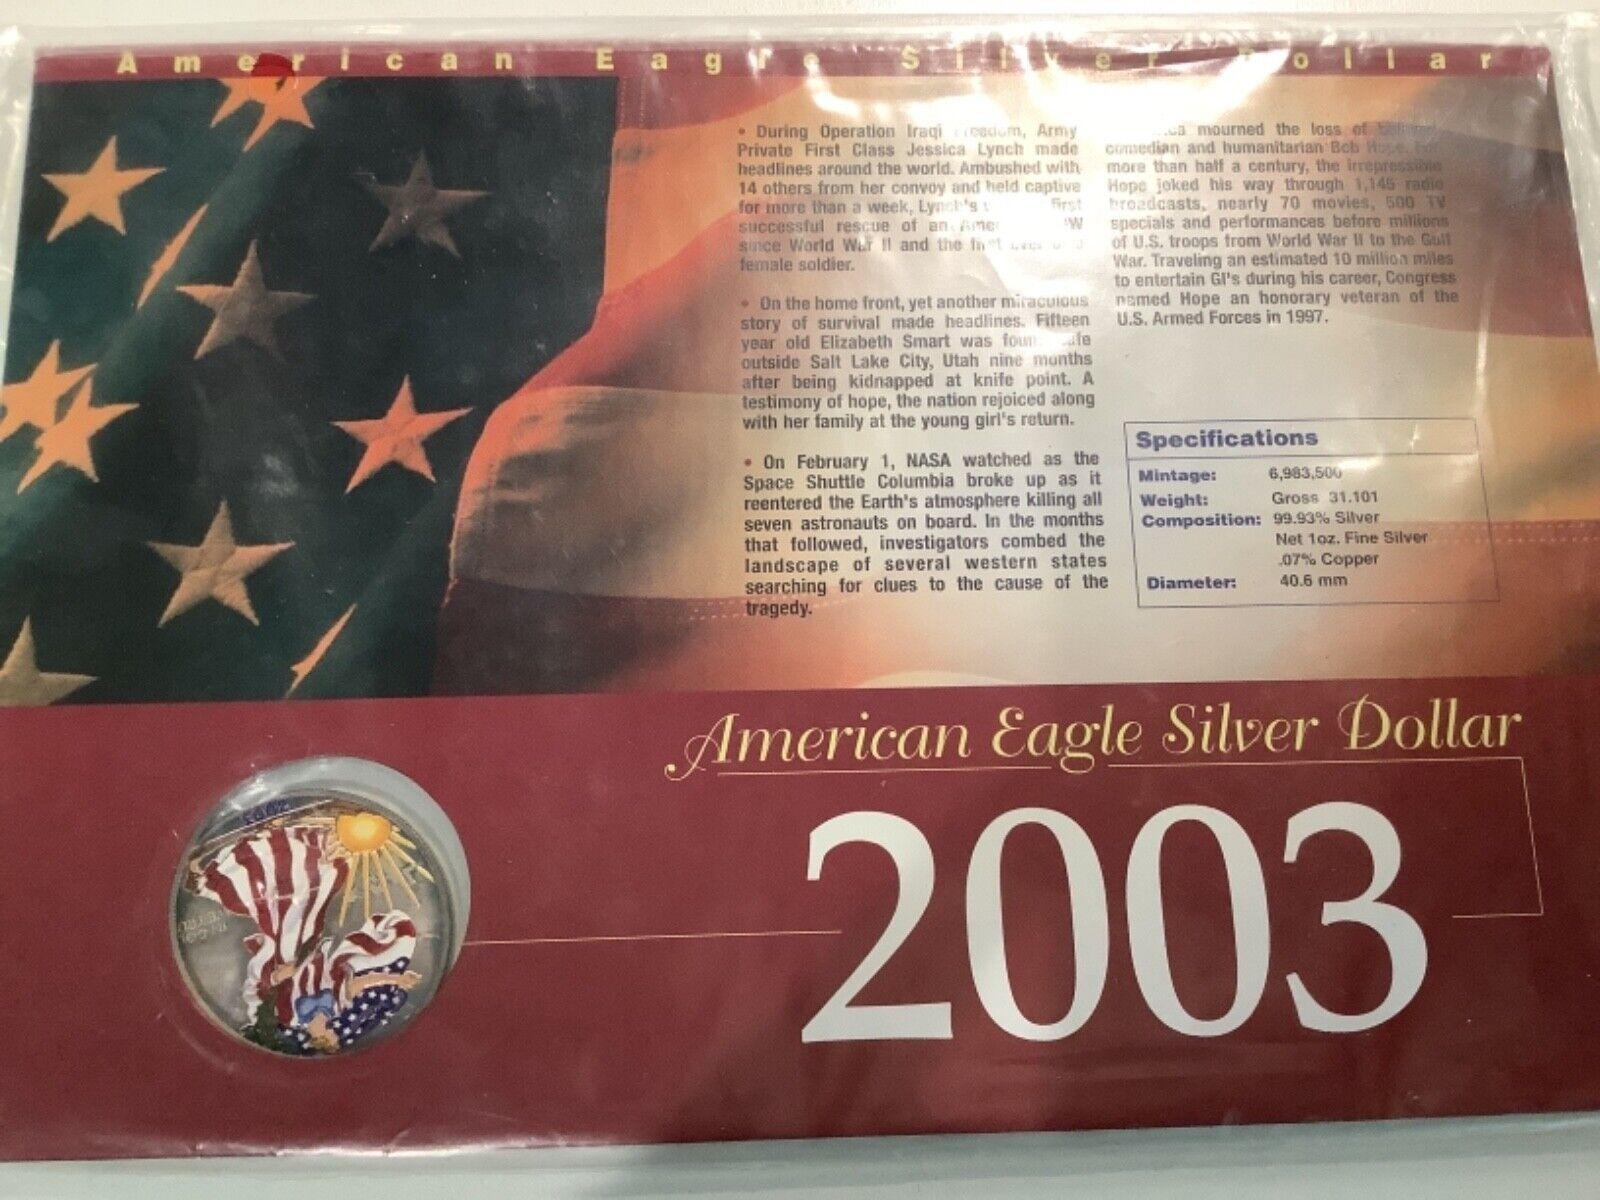 2003 1 American Silver Eagle Dollar, COLORIZED A19.10 - $34.95